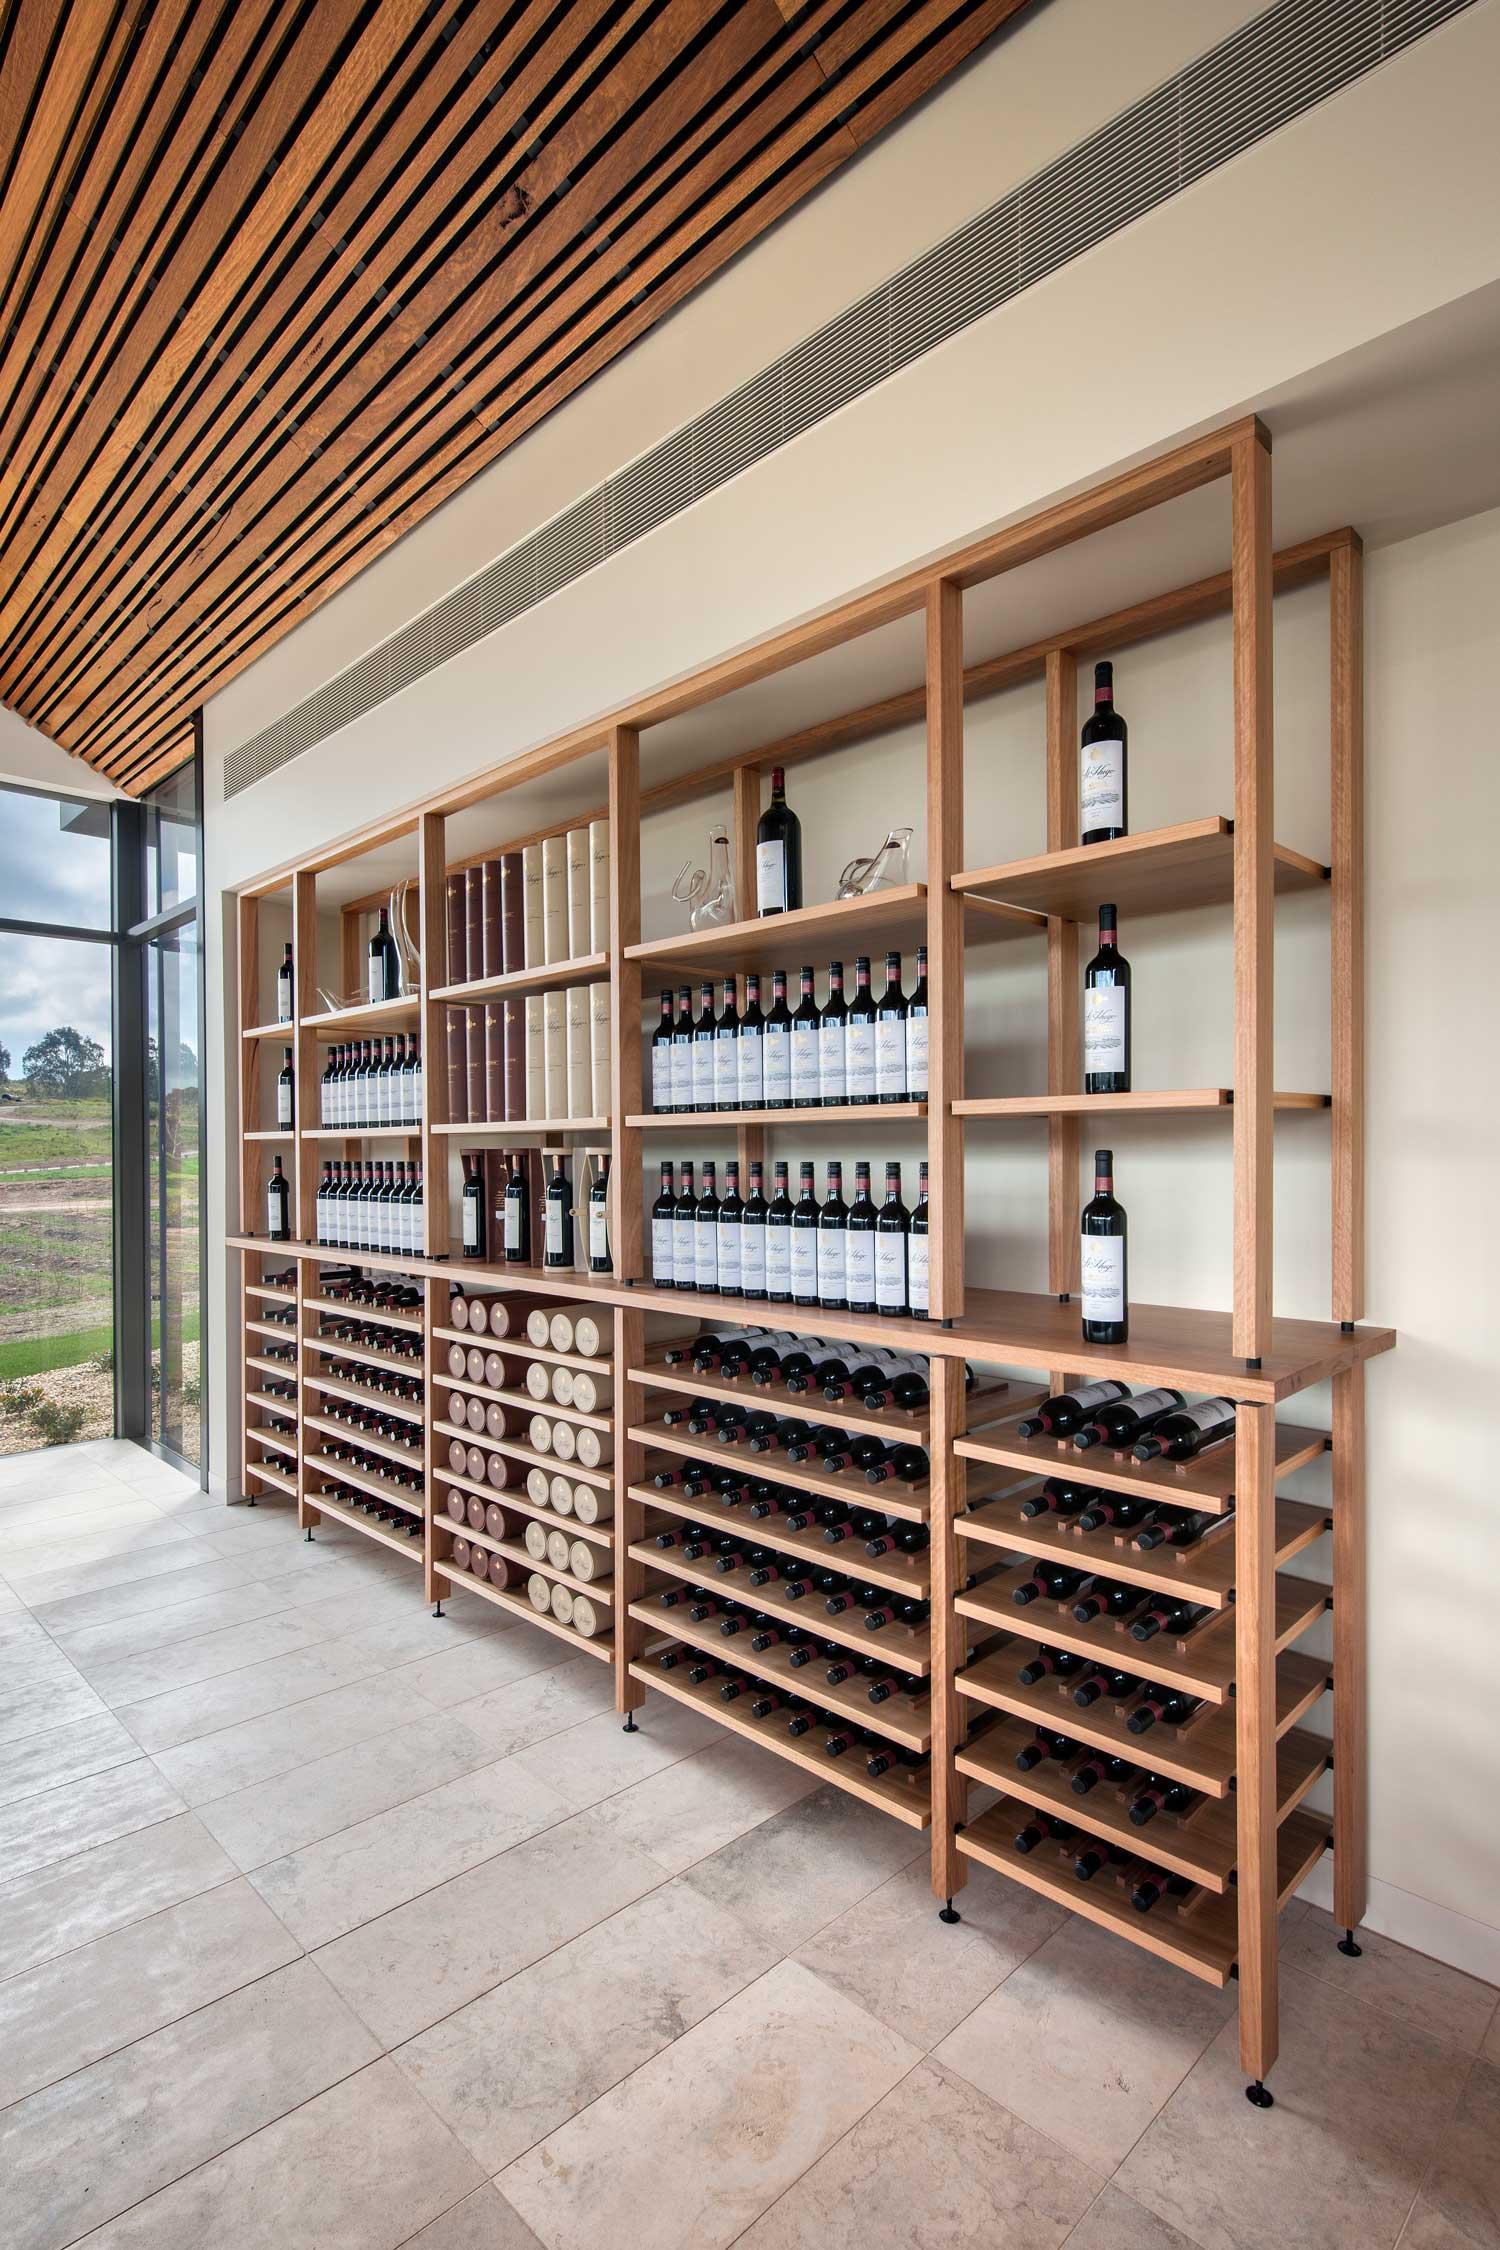 St-Hugo-Wine-Cellar-by-Studio-Gram-with-JBG-Architects-Yellowtrace-09.jpg